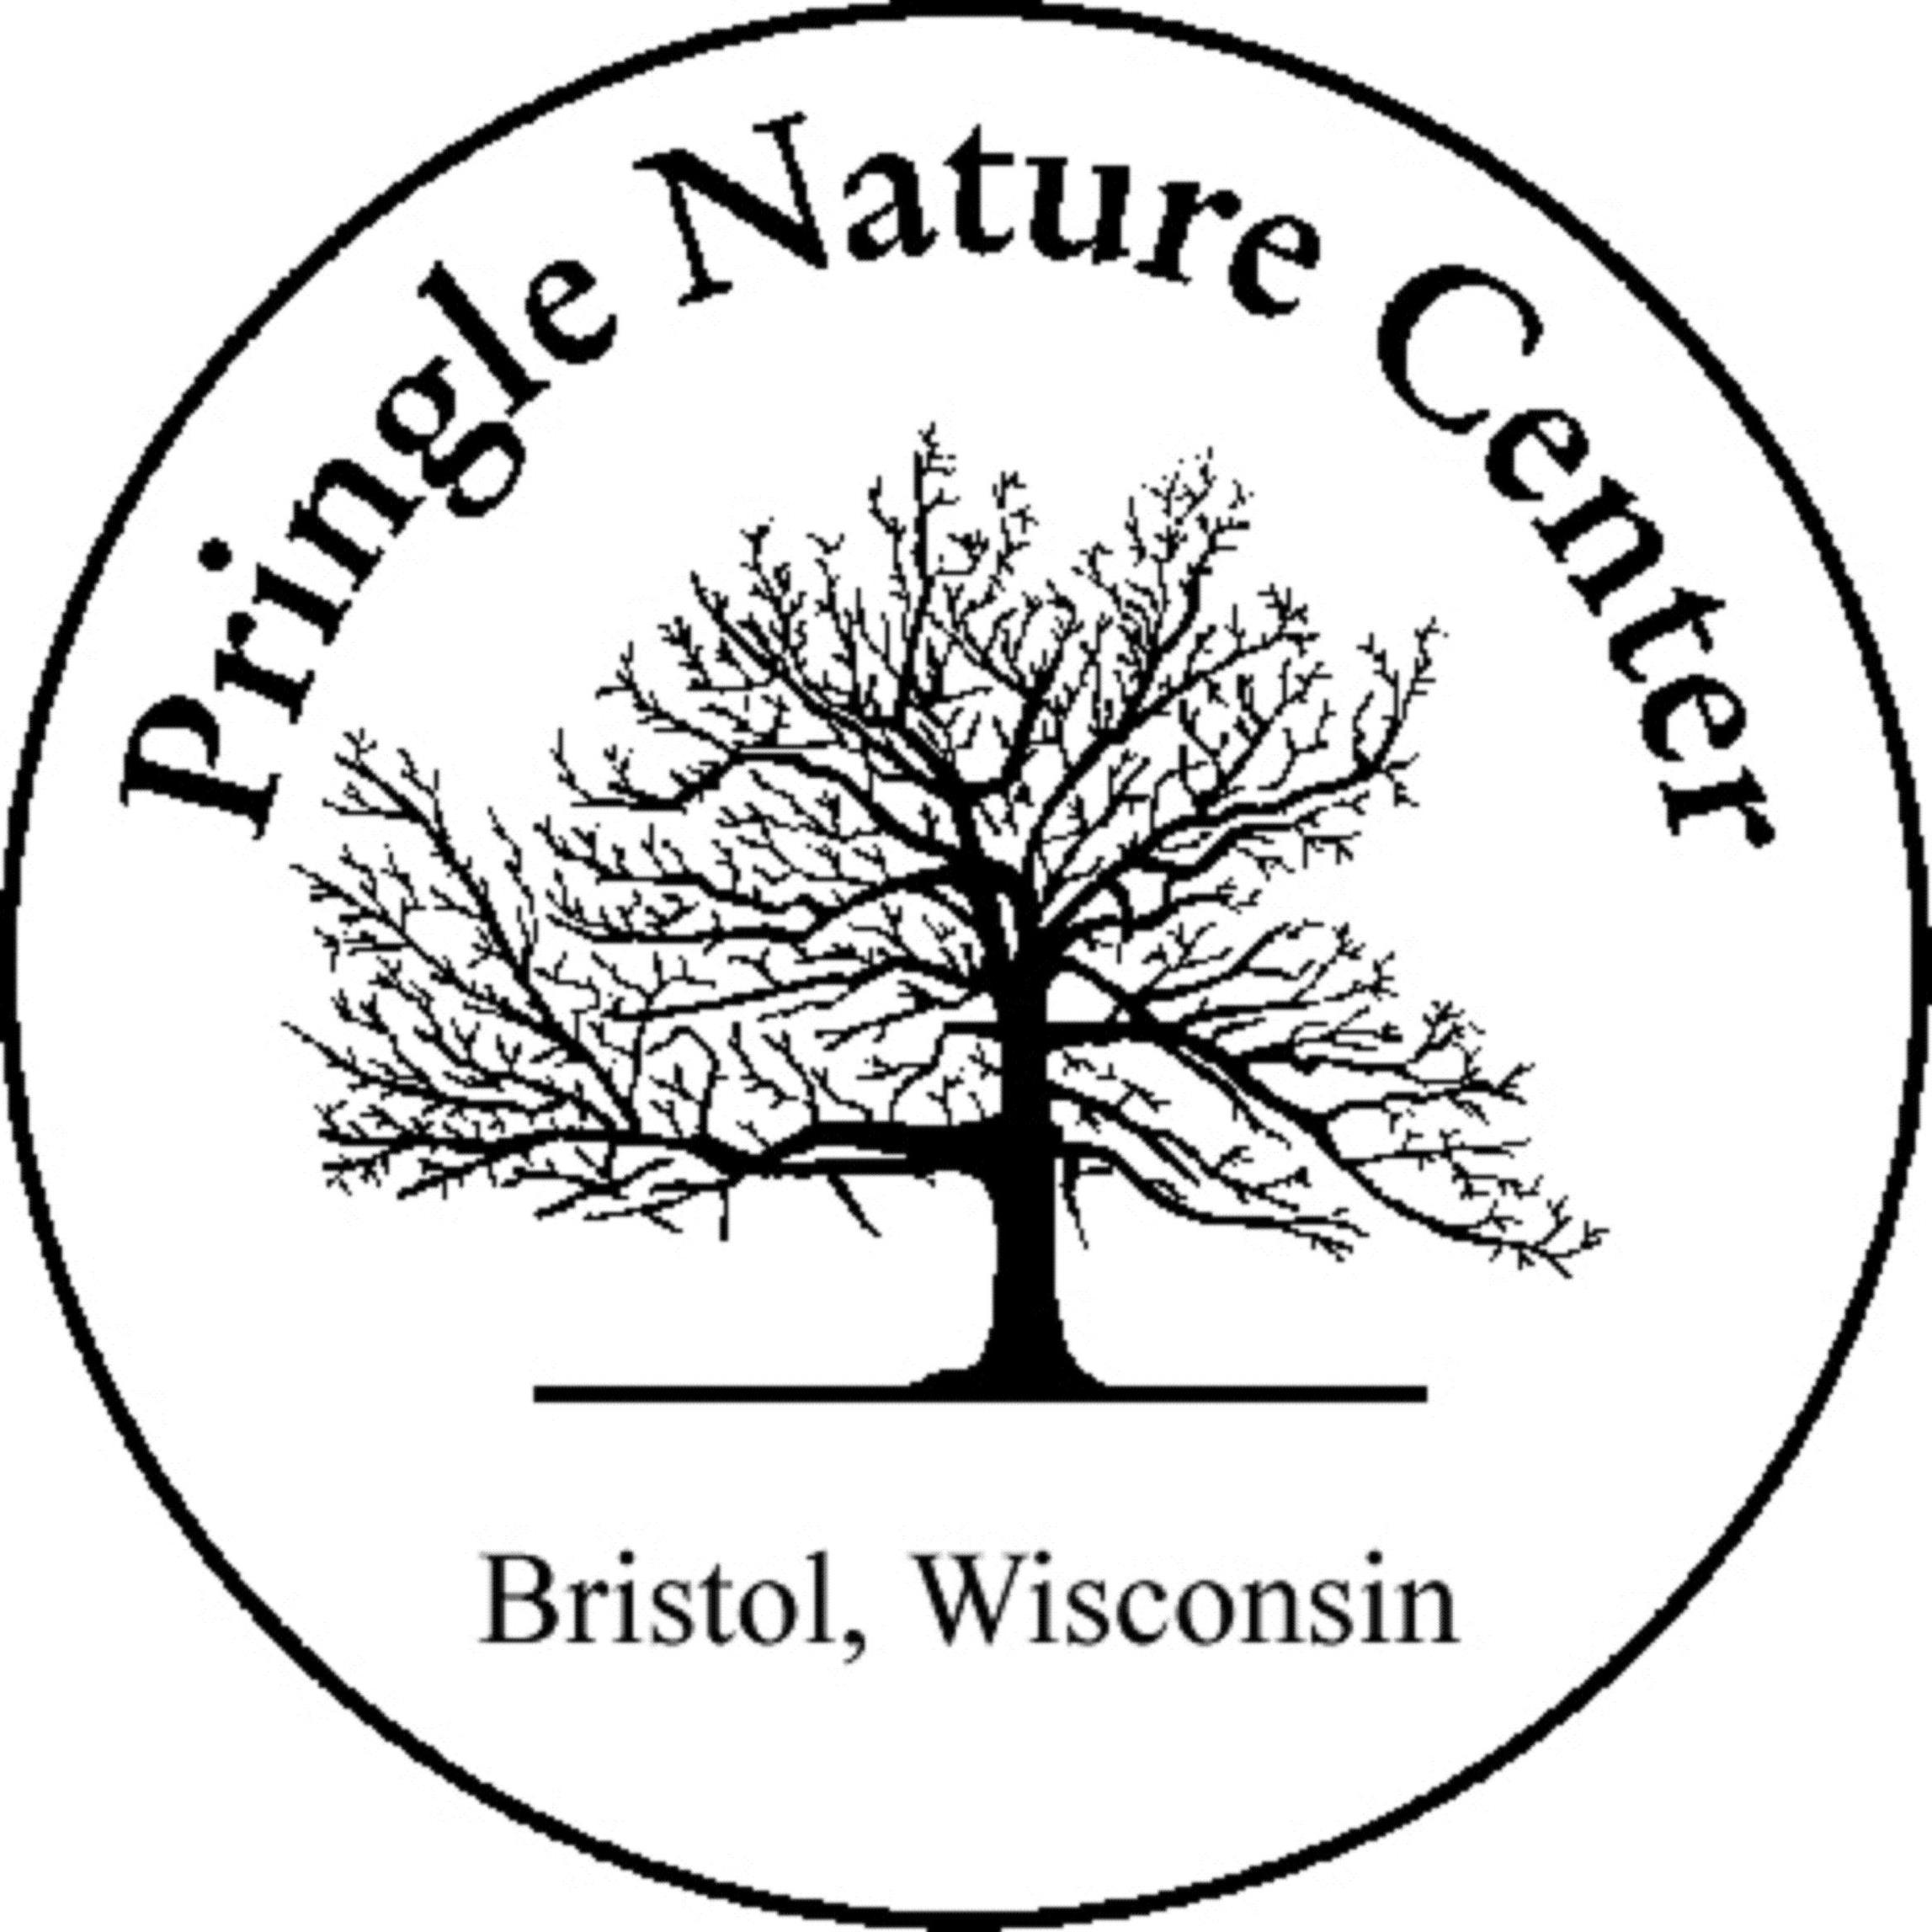 Pringle Nature Center logo